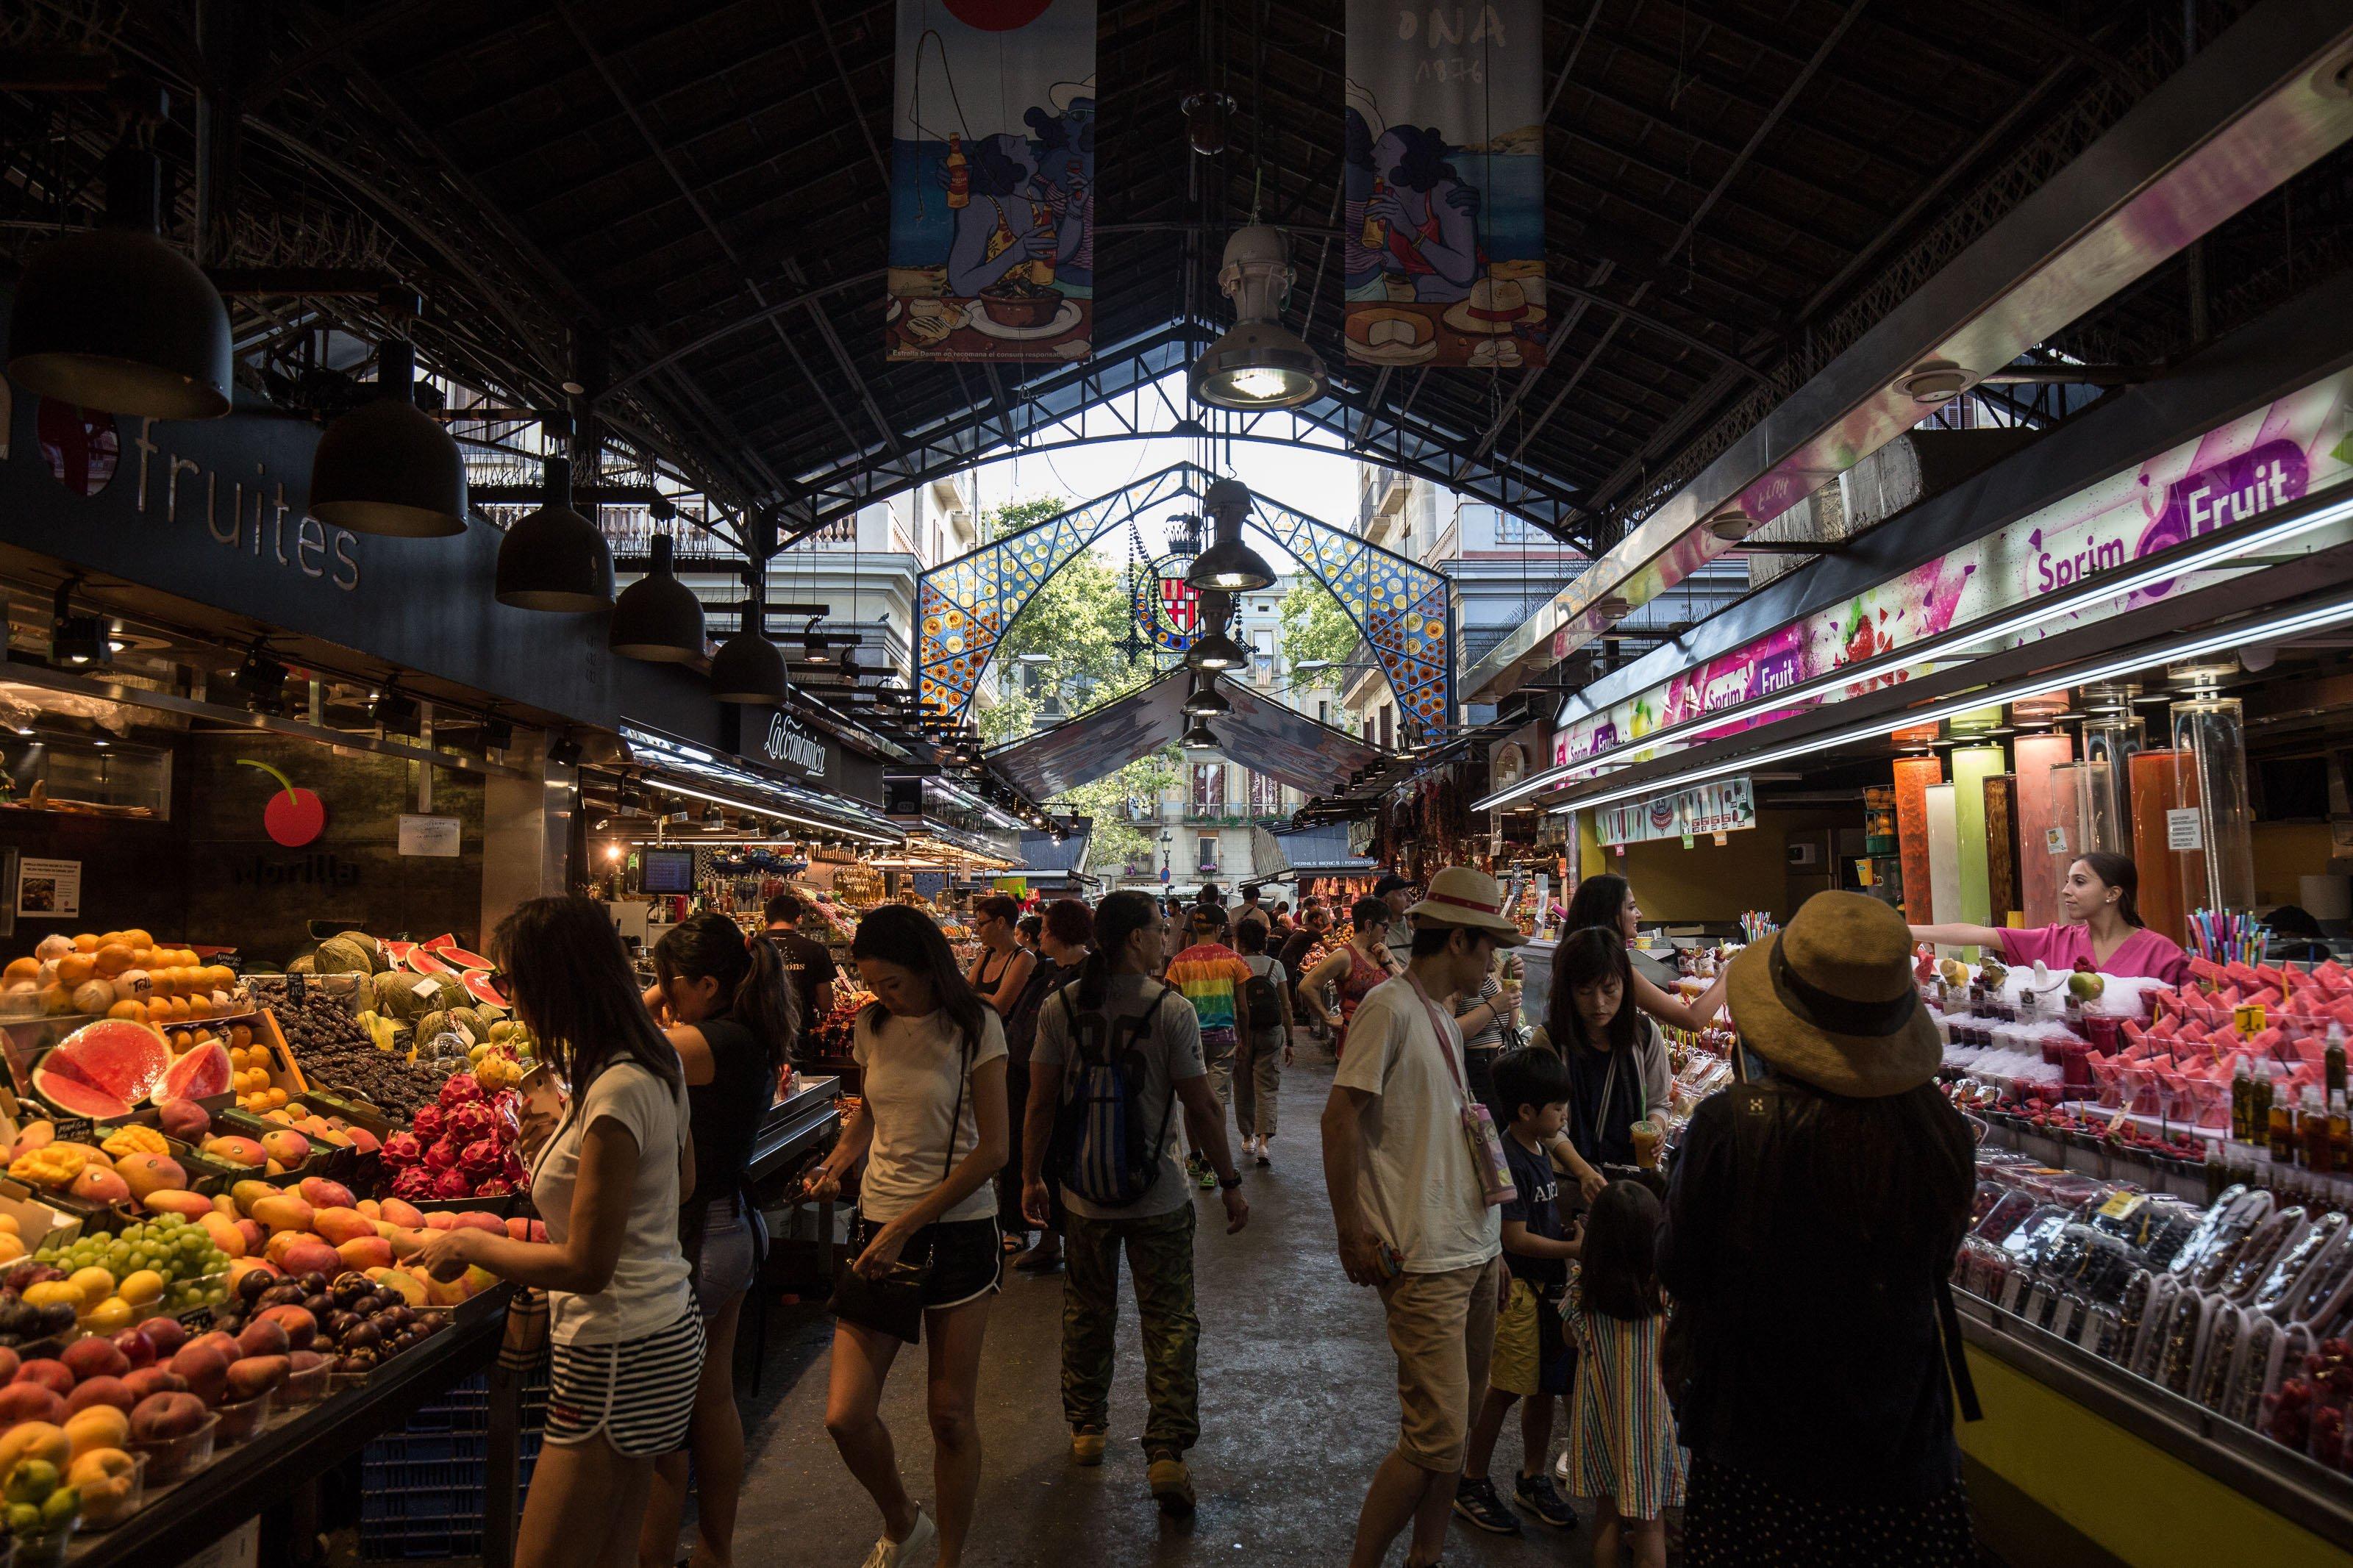 comerç compra mercat boqueria barcelona turistes - Carles Palacio